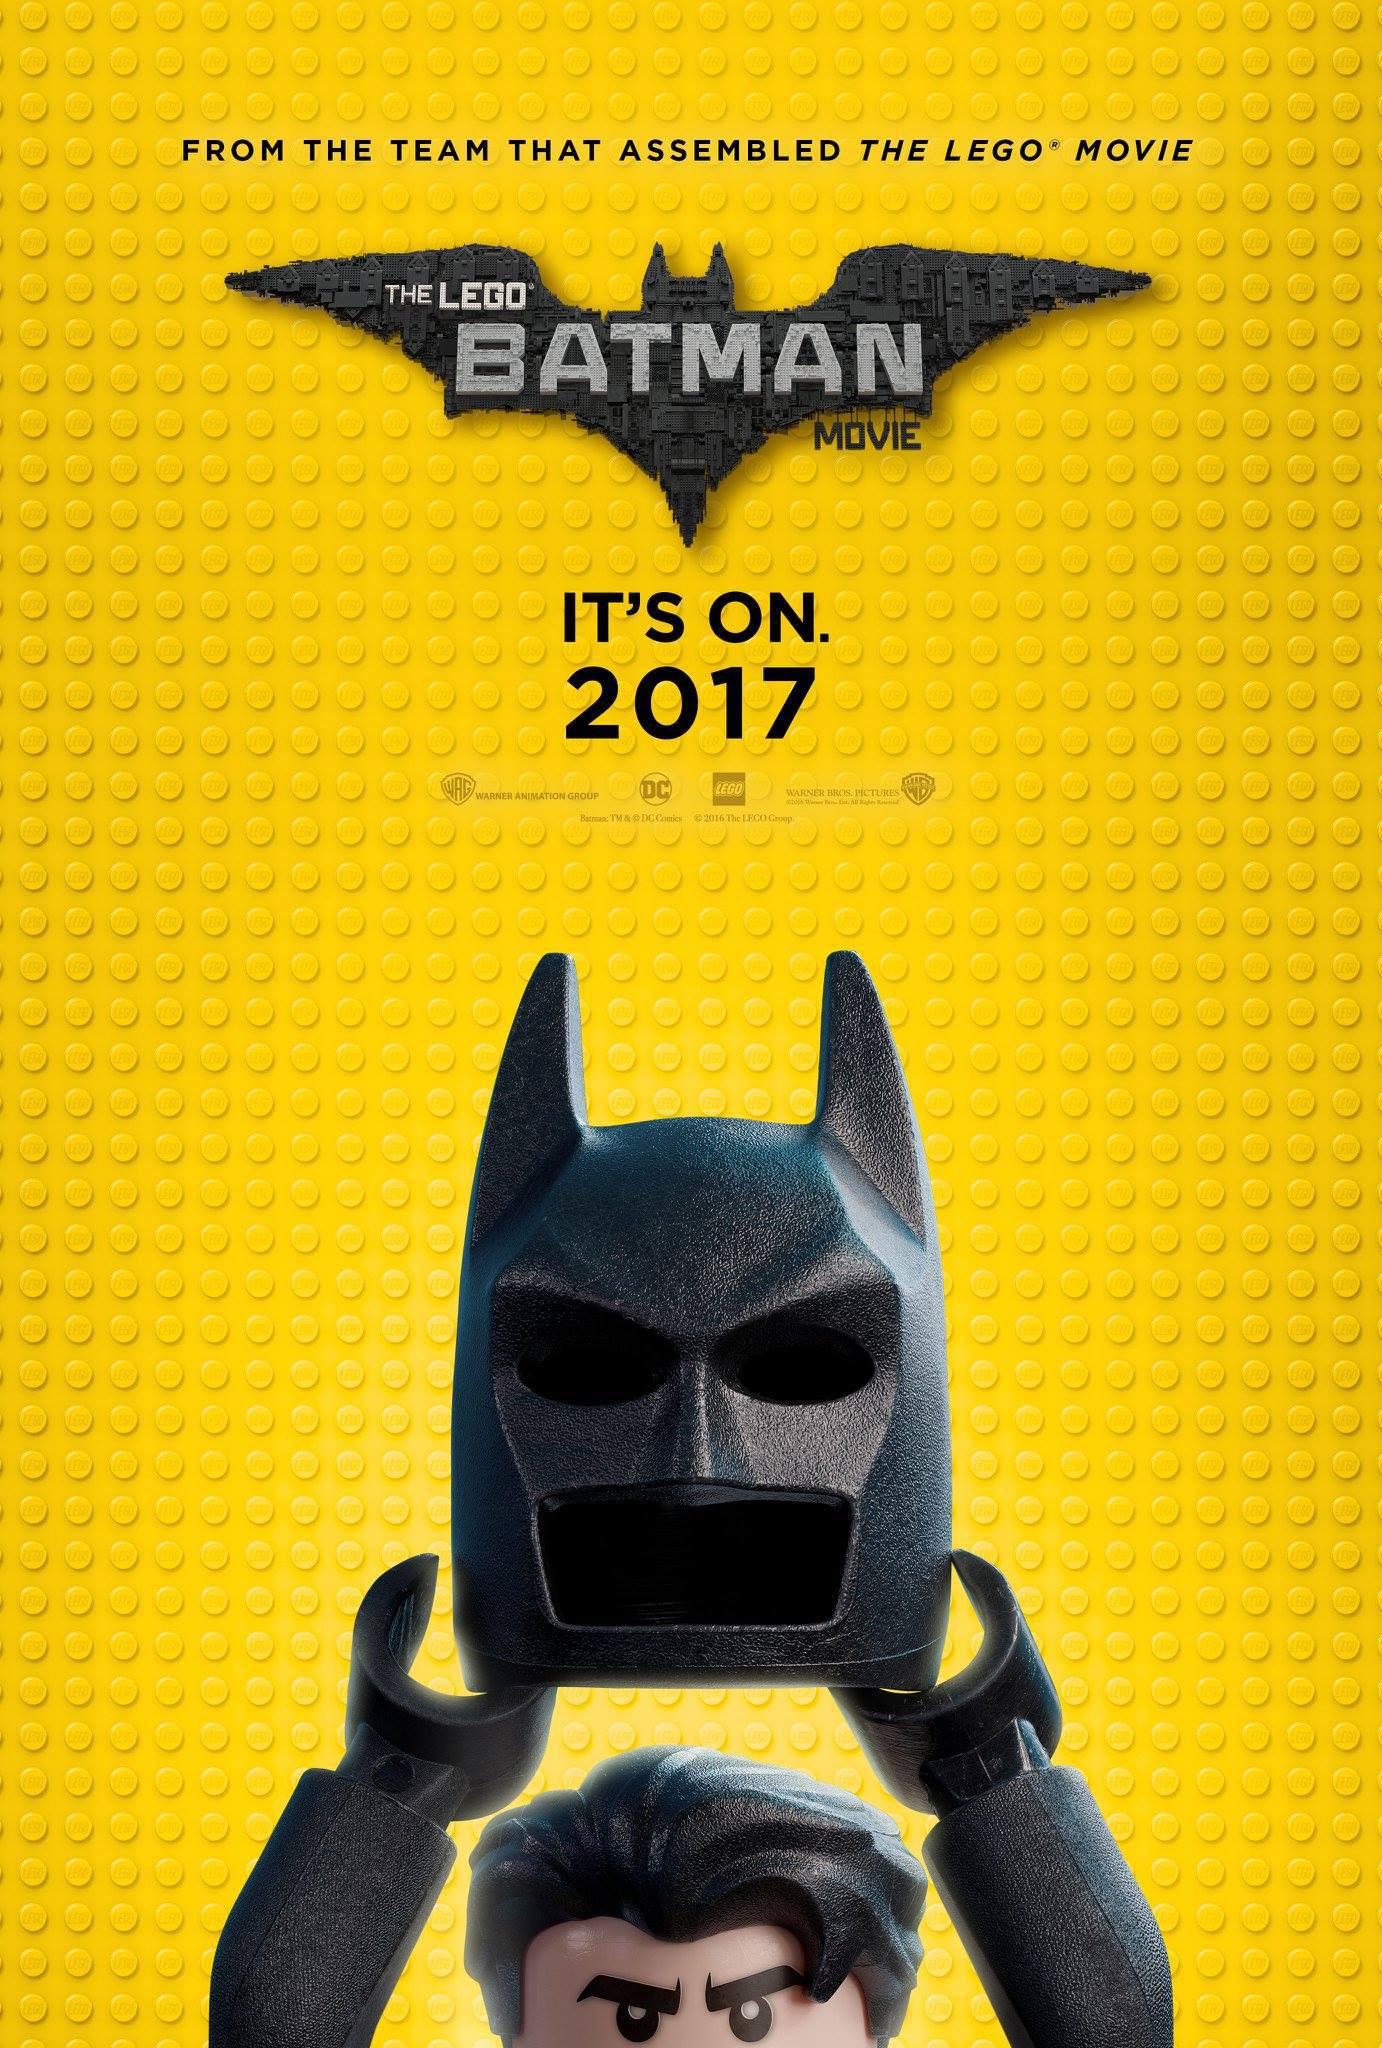 lego_batman_movie_p2.png